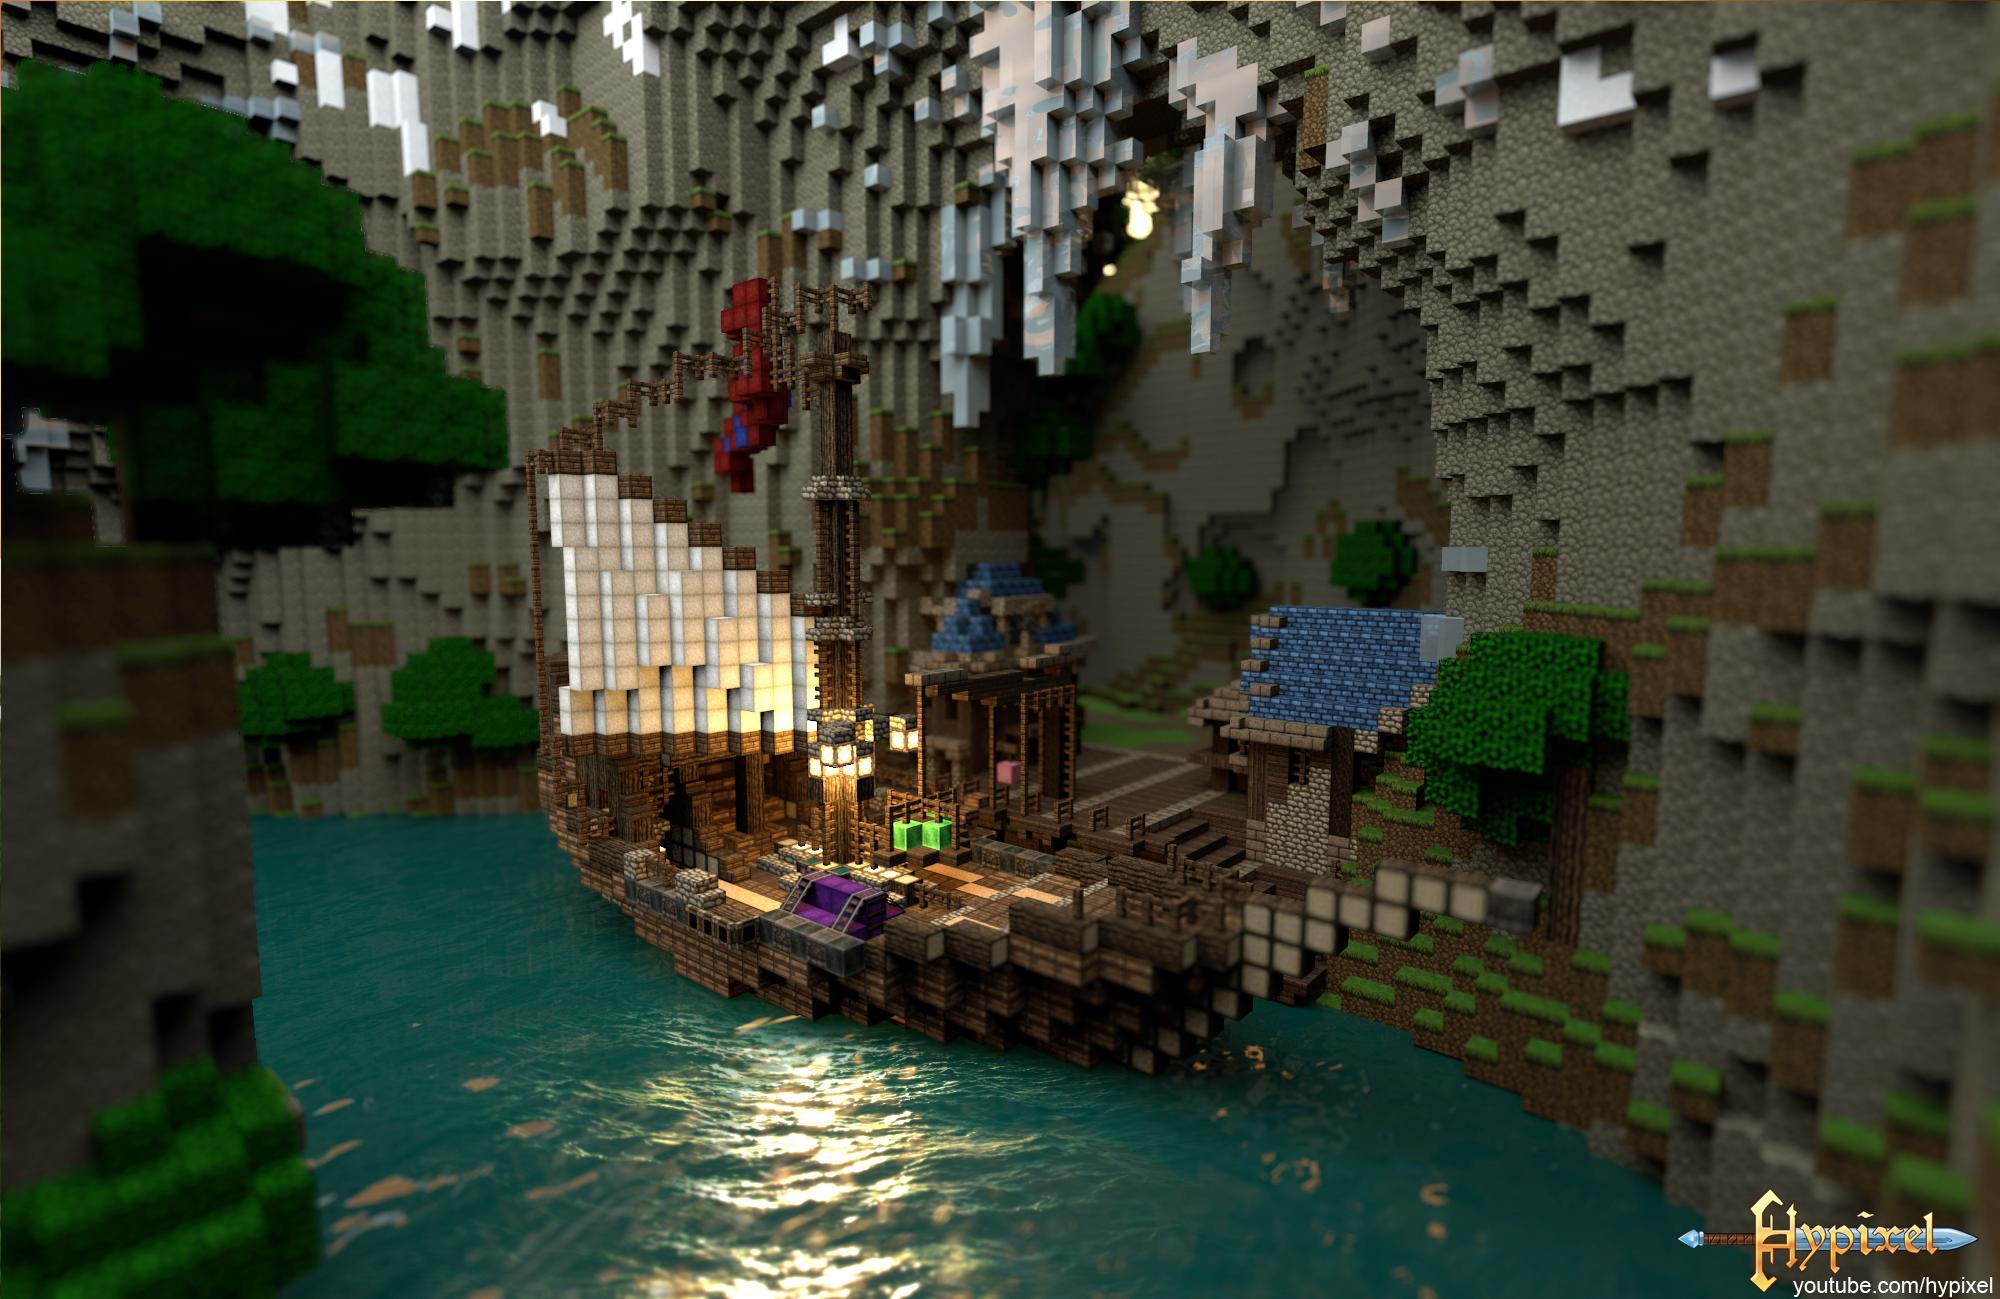 3d House Wallpaper Room Wrath Of The Fallen Map Minecraft 1 12 2